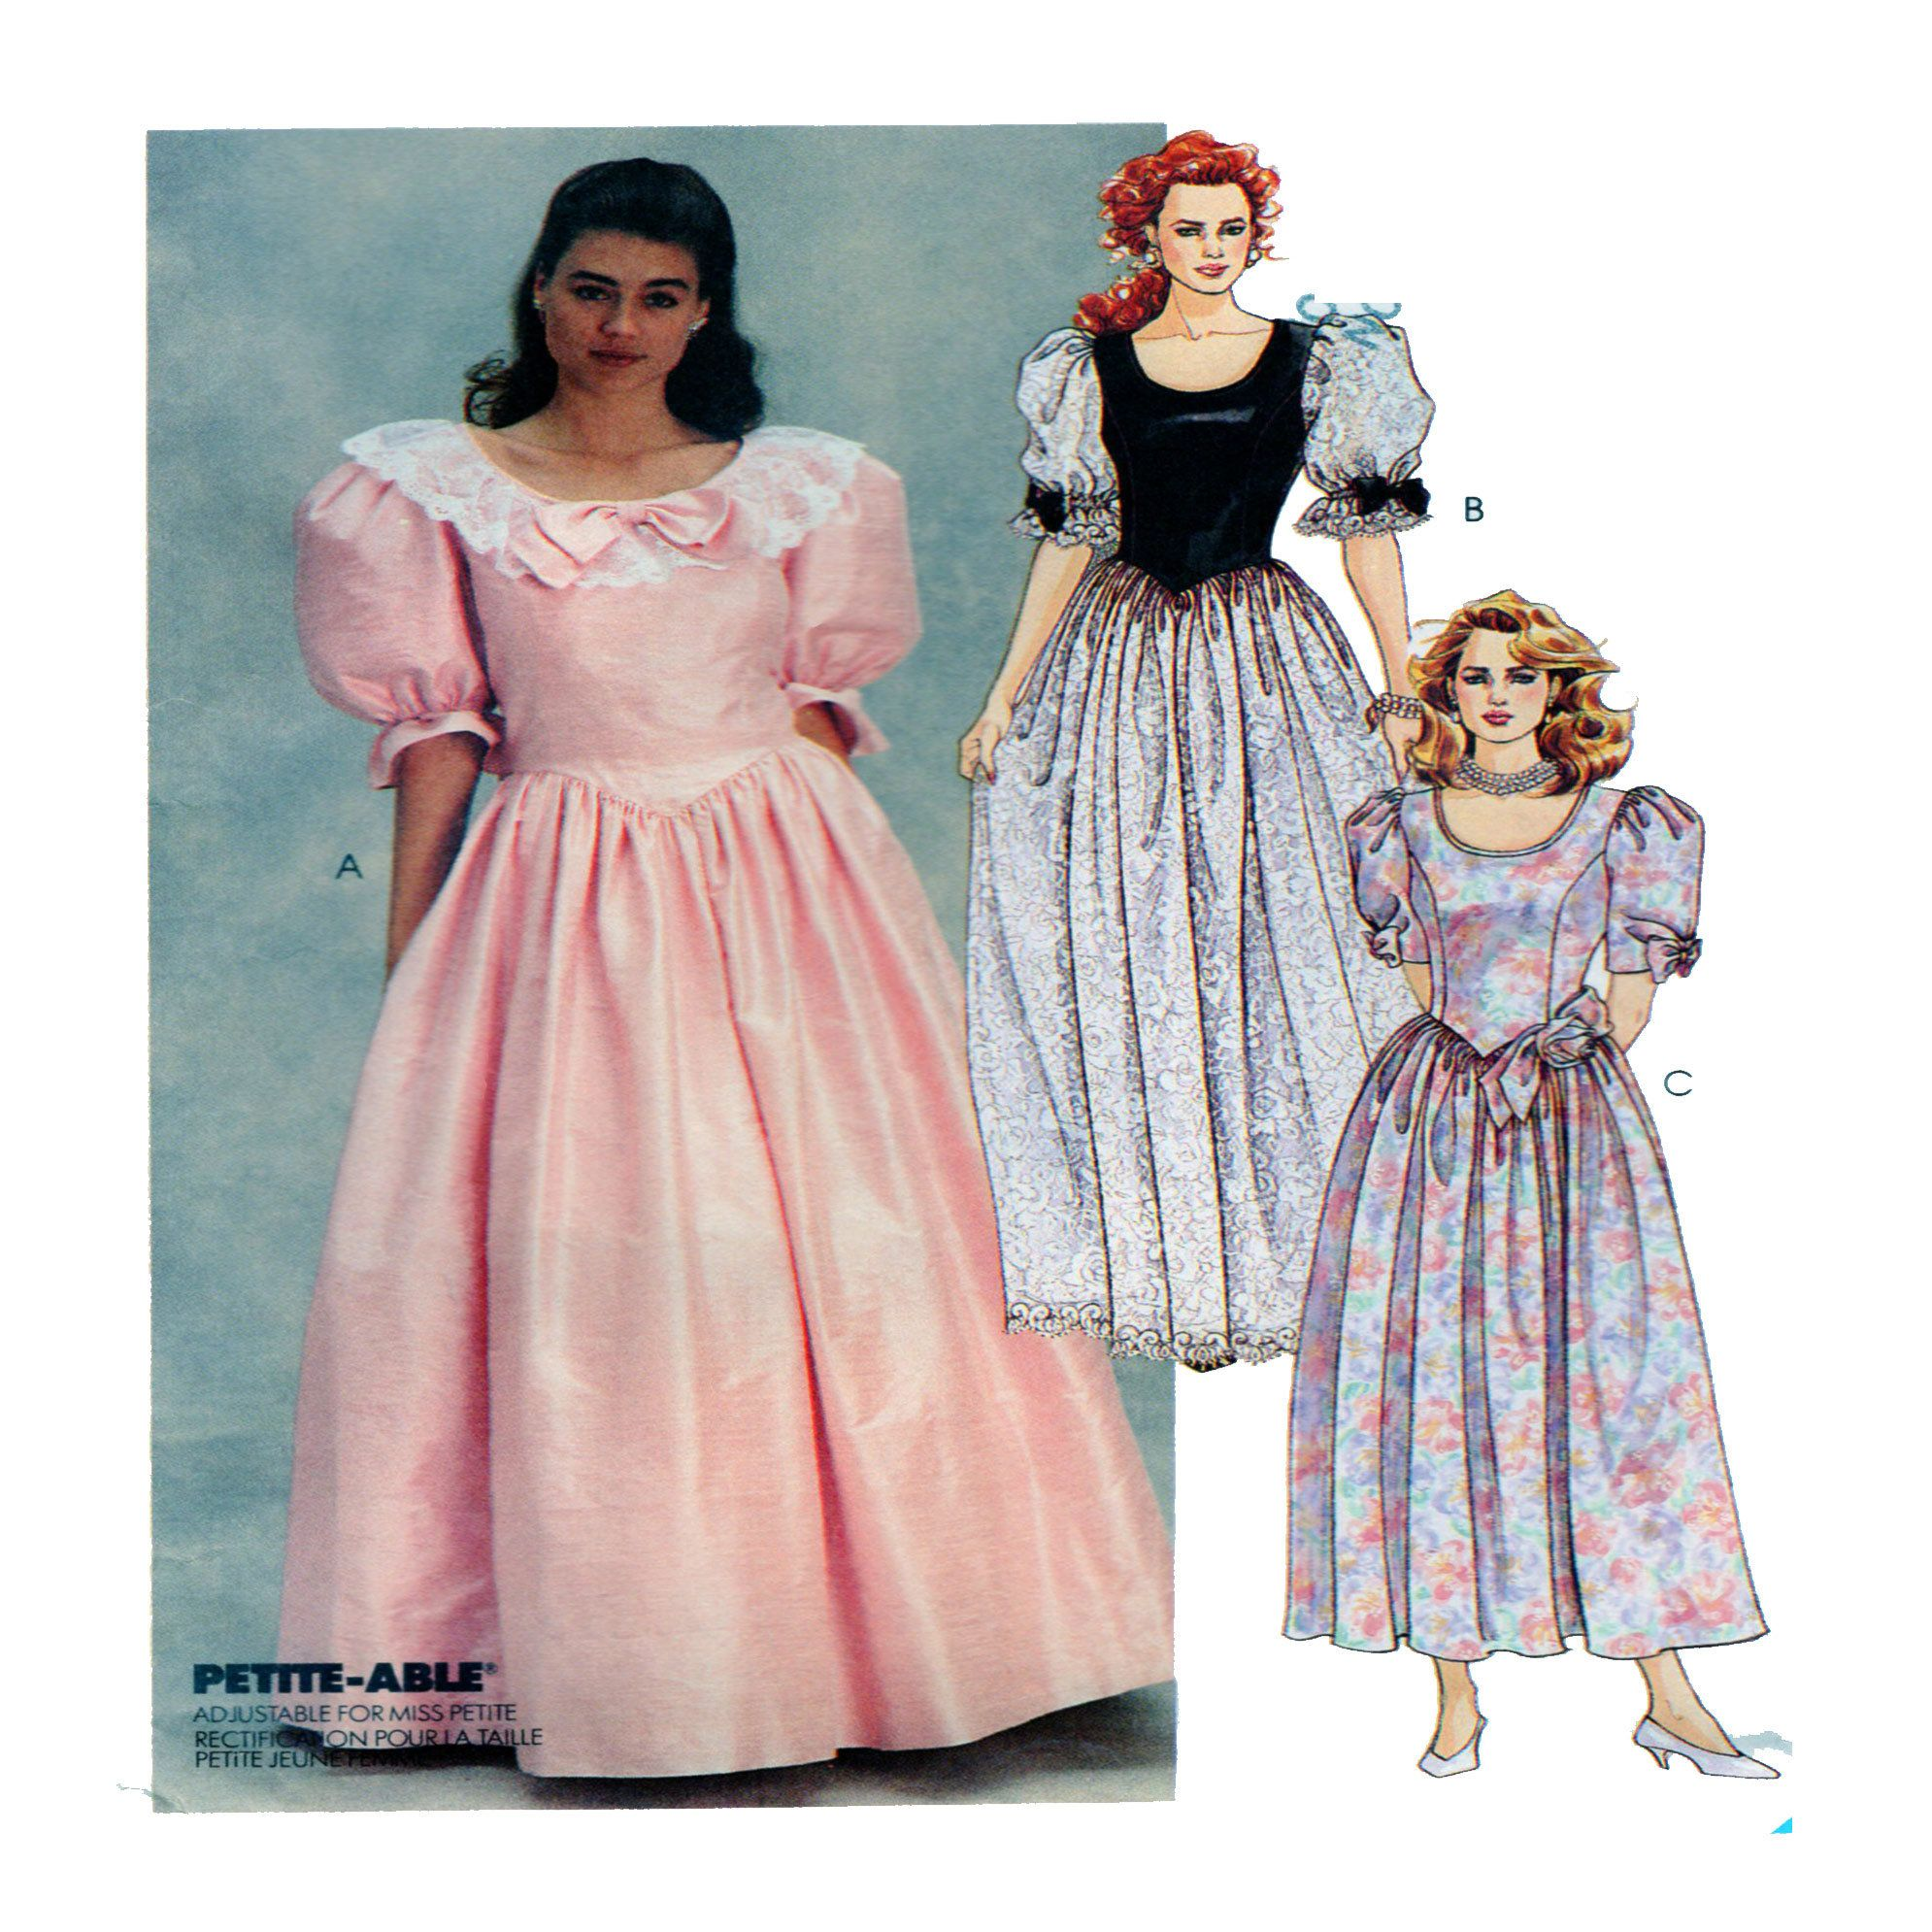 Mccalls 4694 special event gown princess seam round